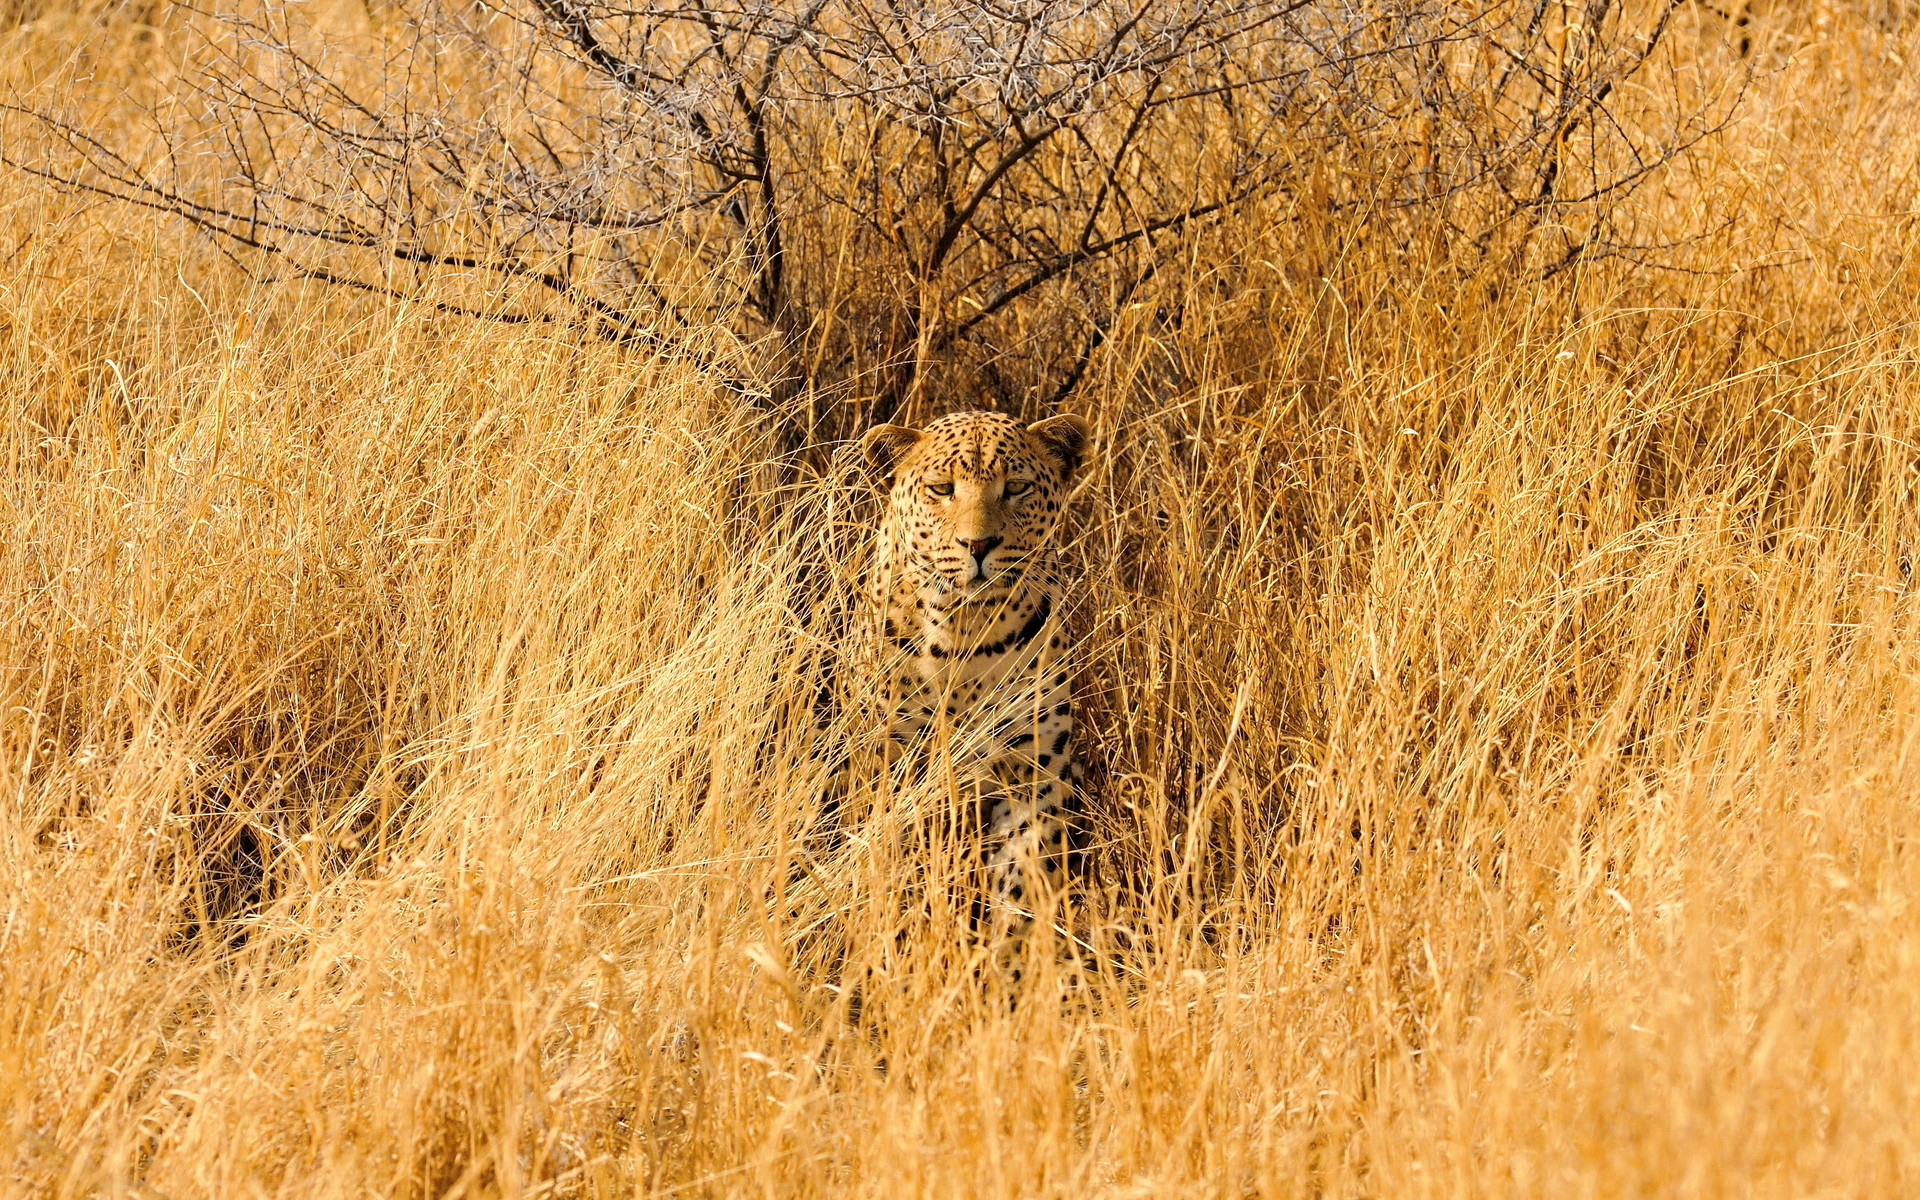 Leopard savannah animals cats wildlife predator africa grass landscapes camo  spots fields wallpaper